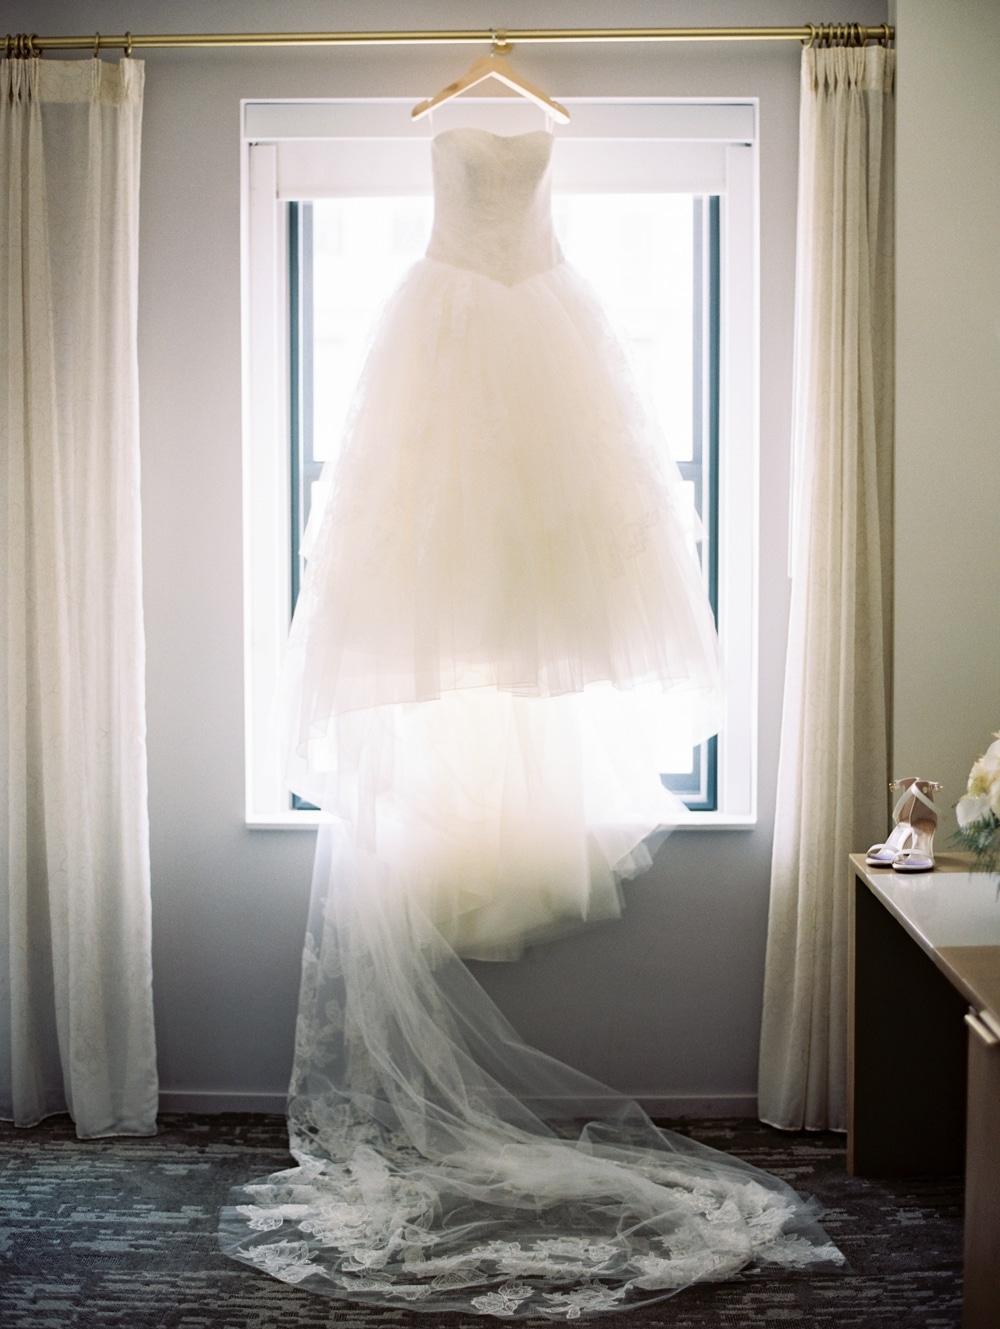 kristin-la-voie-photography-Cincinnati-Music-Hall-Wedding-5